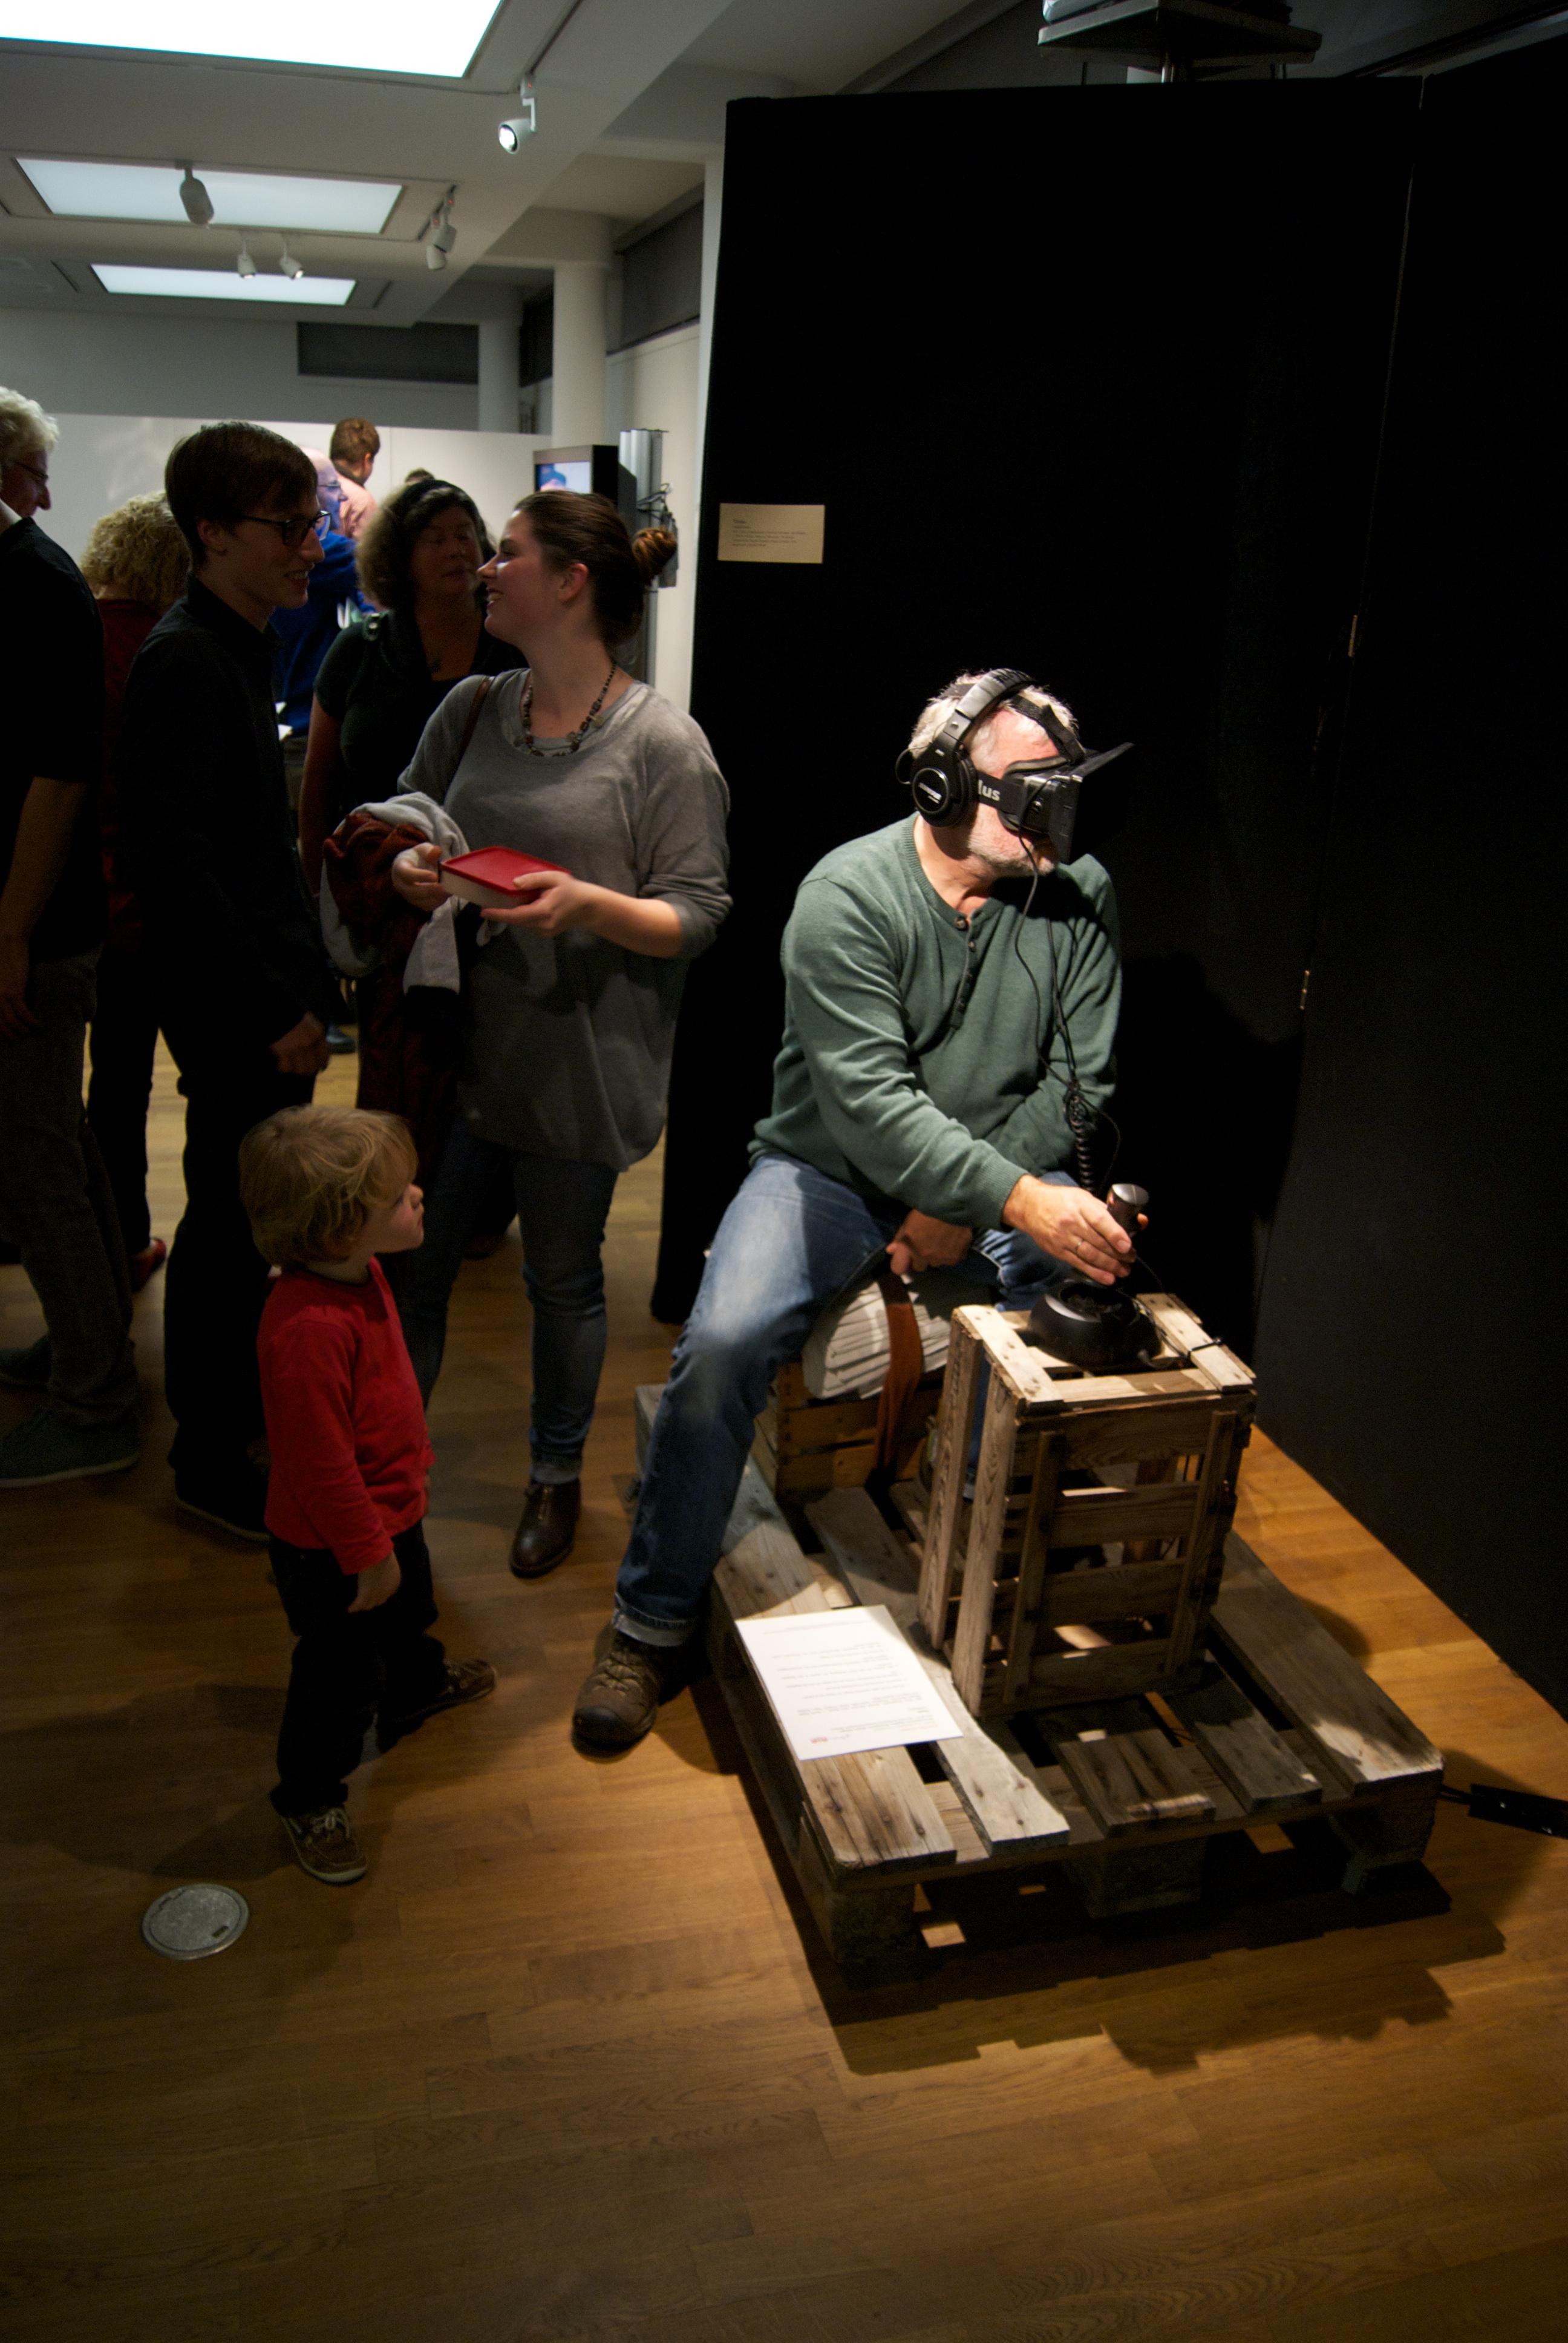 Ausstellung: Station Heimat – Medien I Landschaften I Umwelten